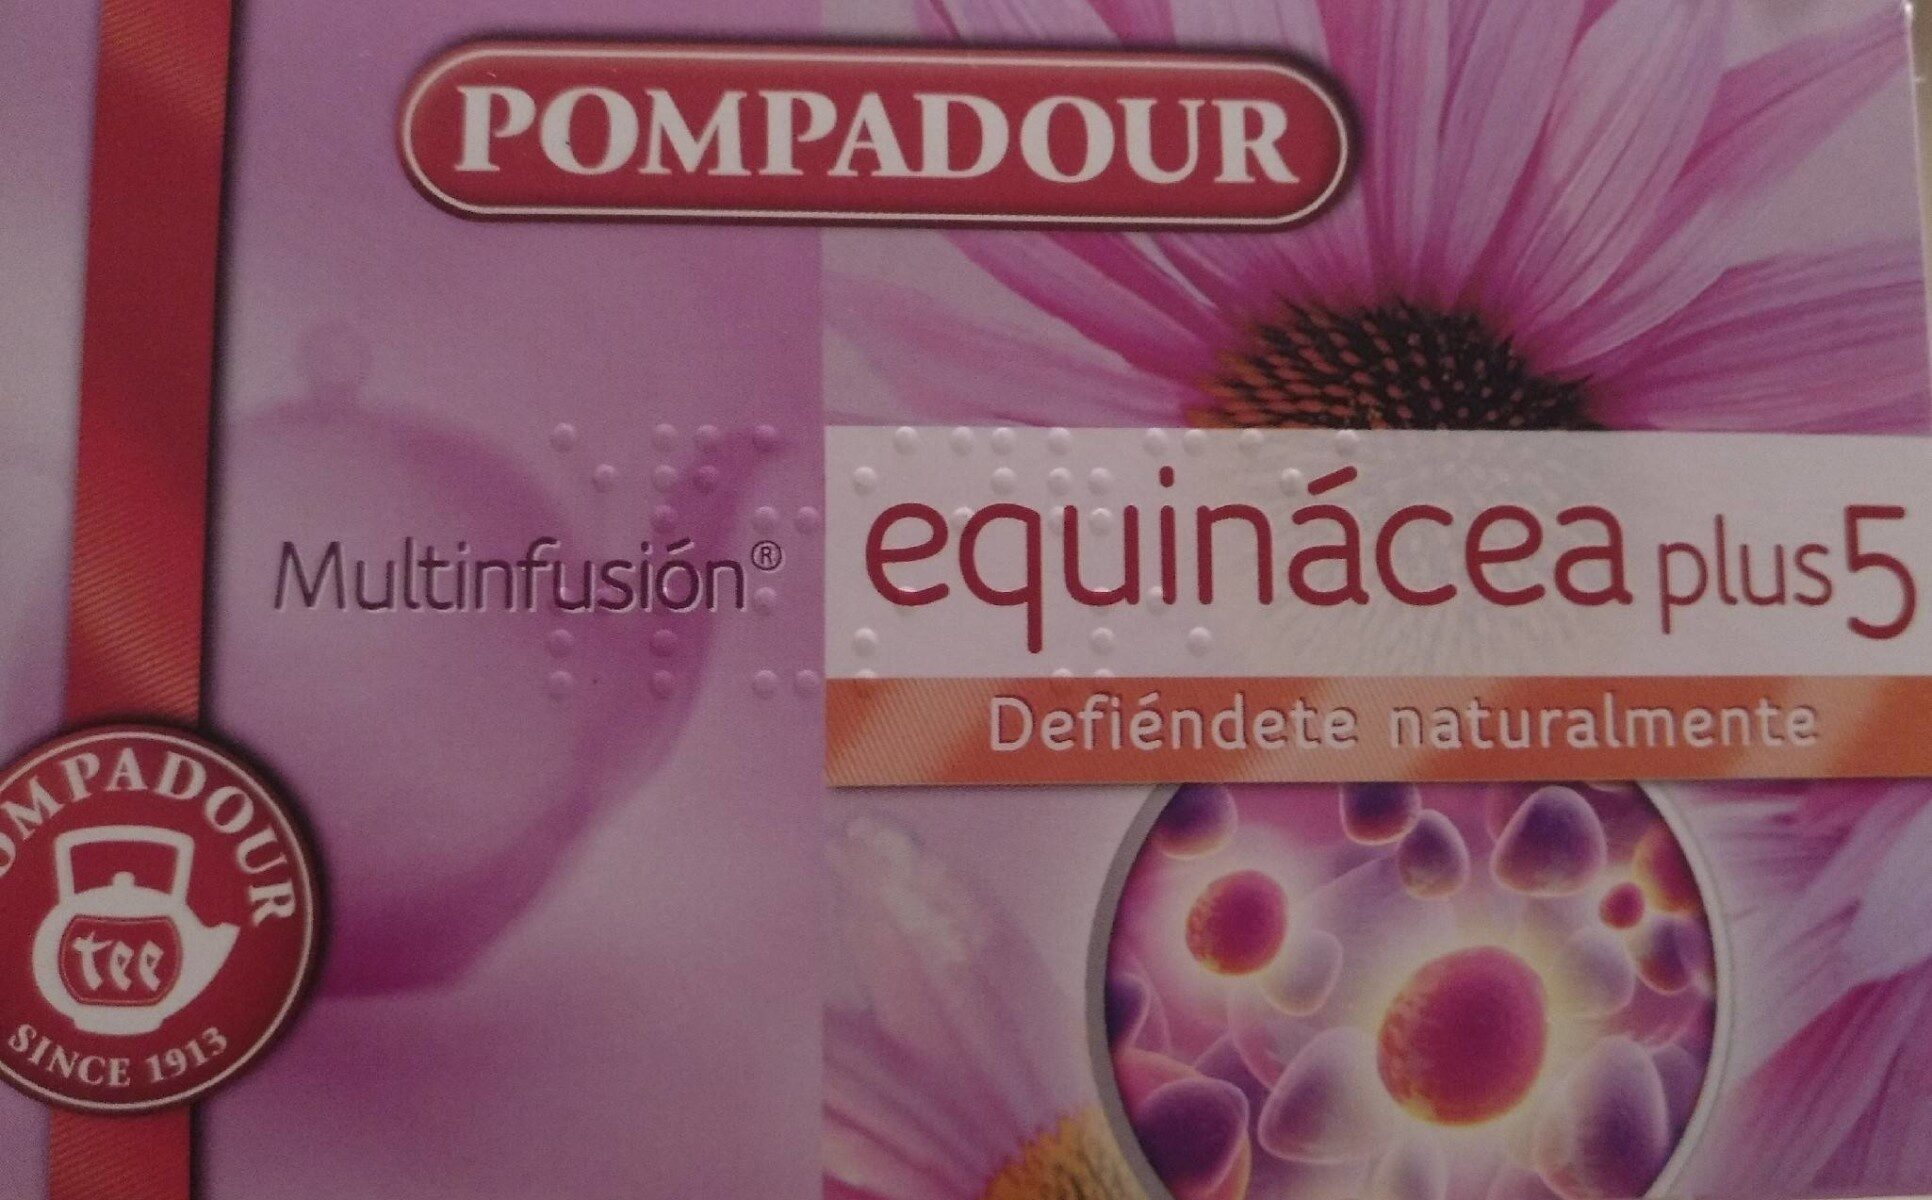 Equinacea plus 5 multinfusión - Product